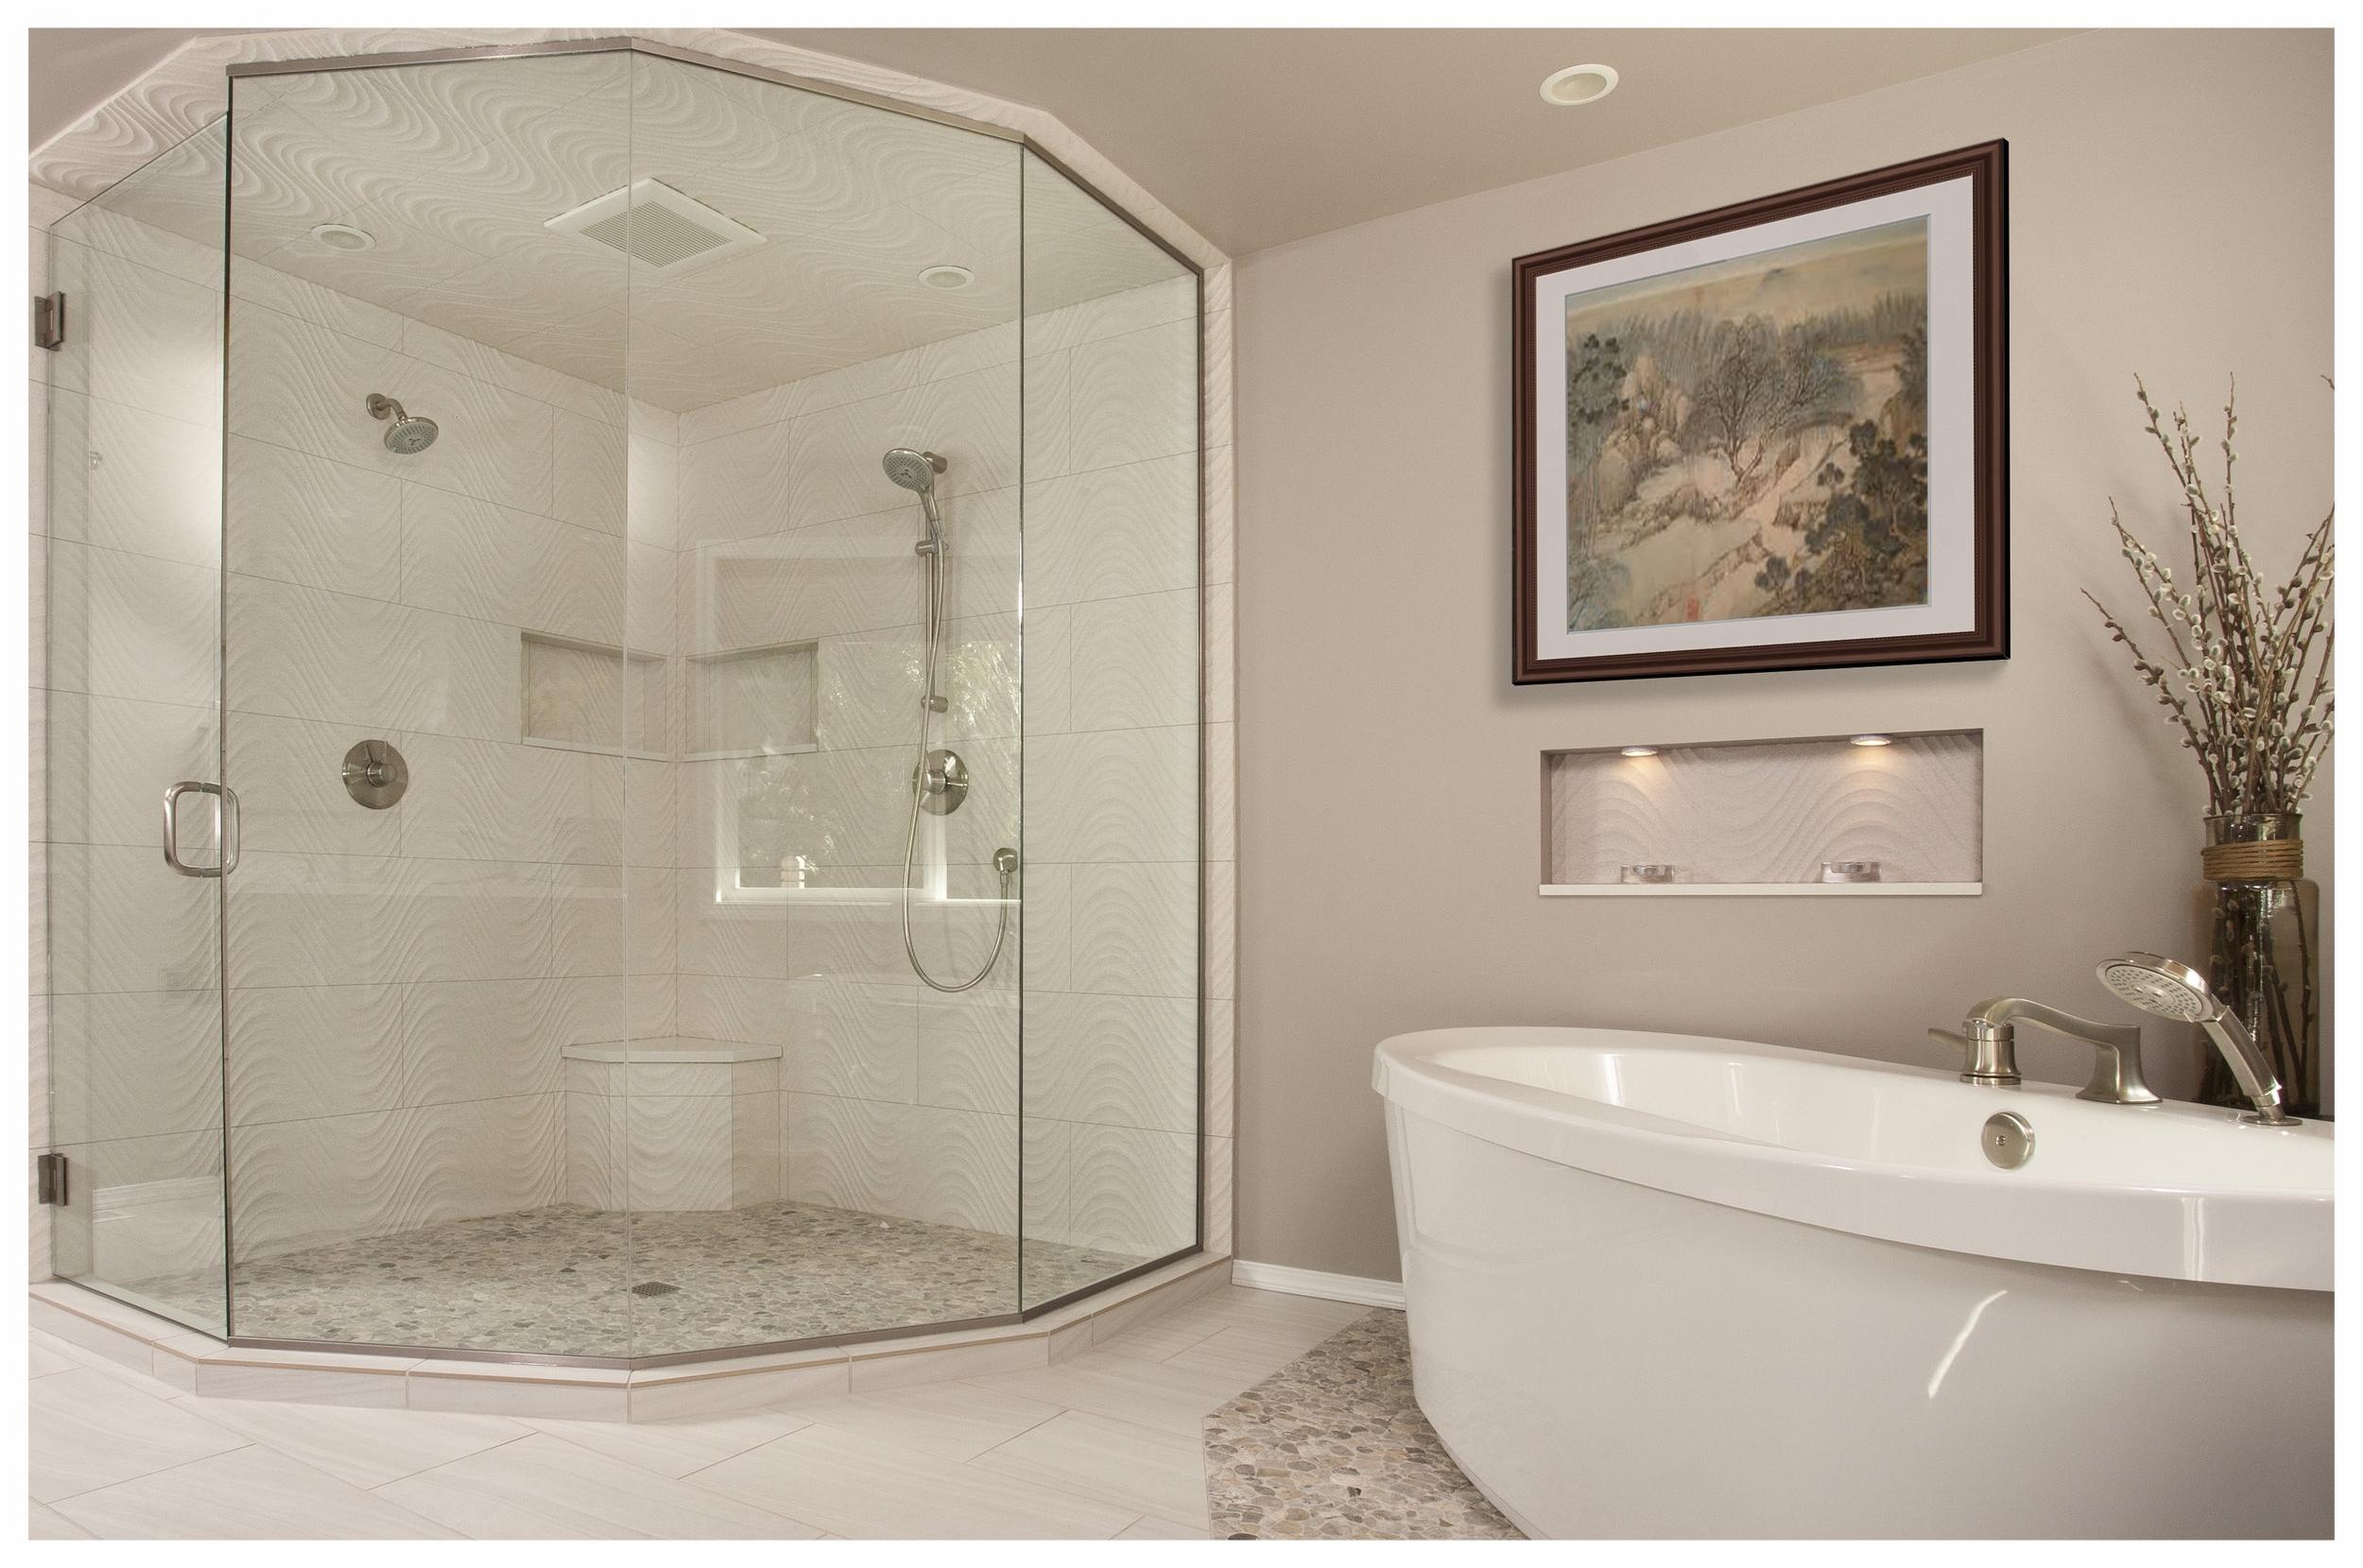 Bellevue Clyde Hill Contemporary Master Bath 3.jpg